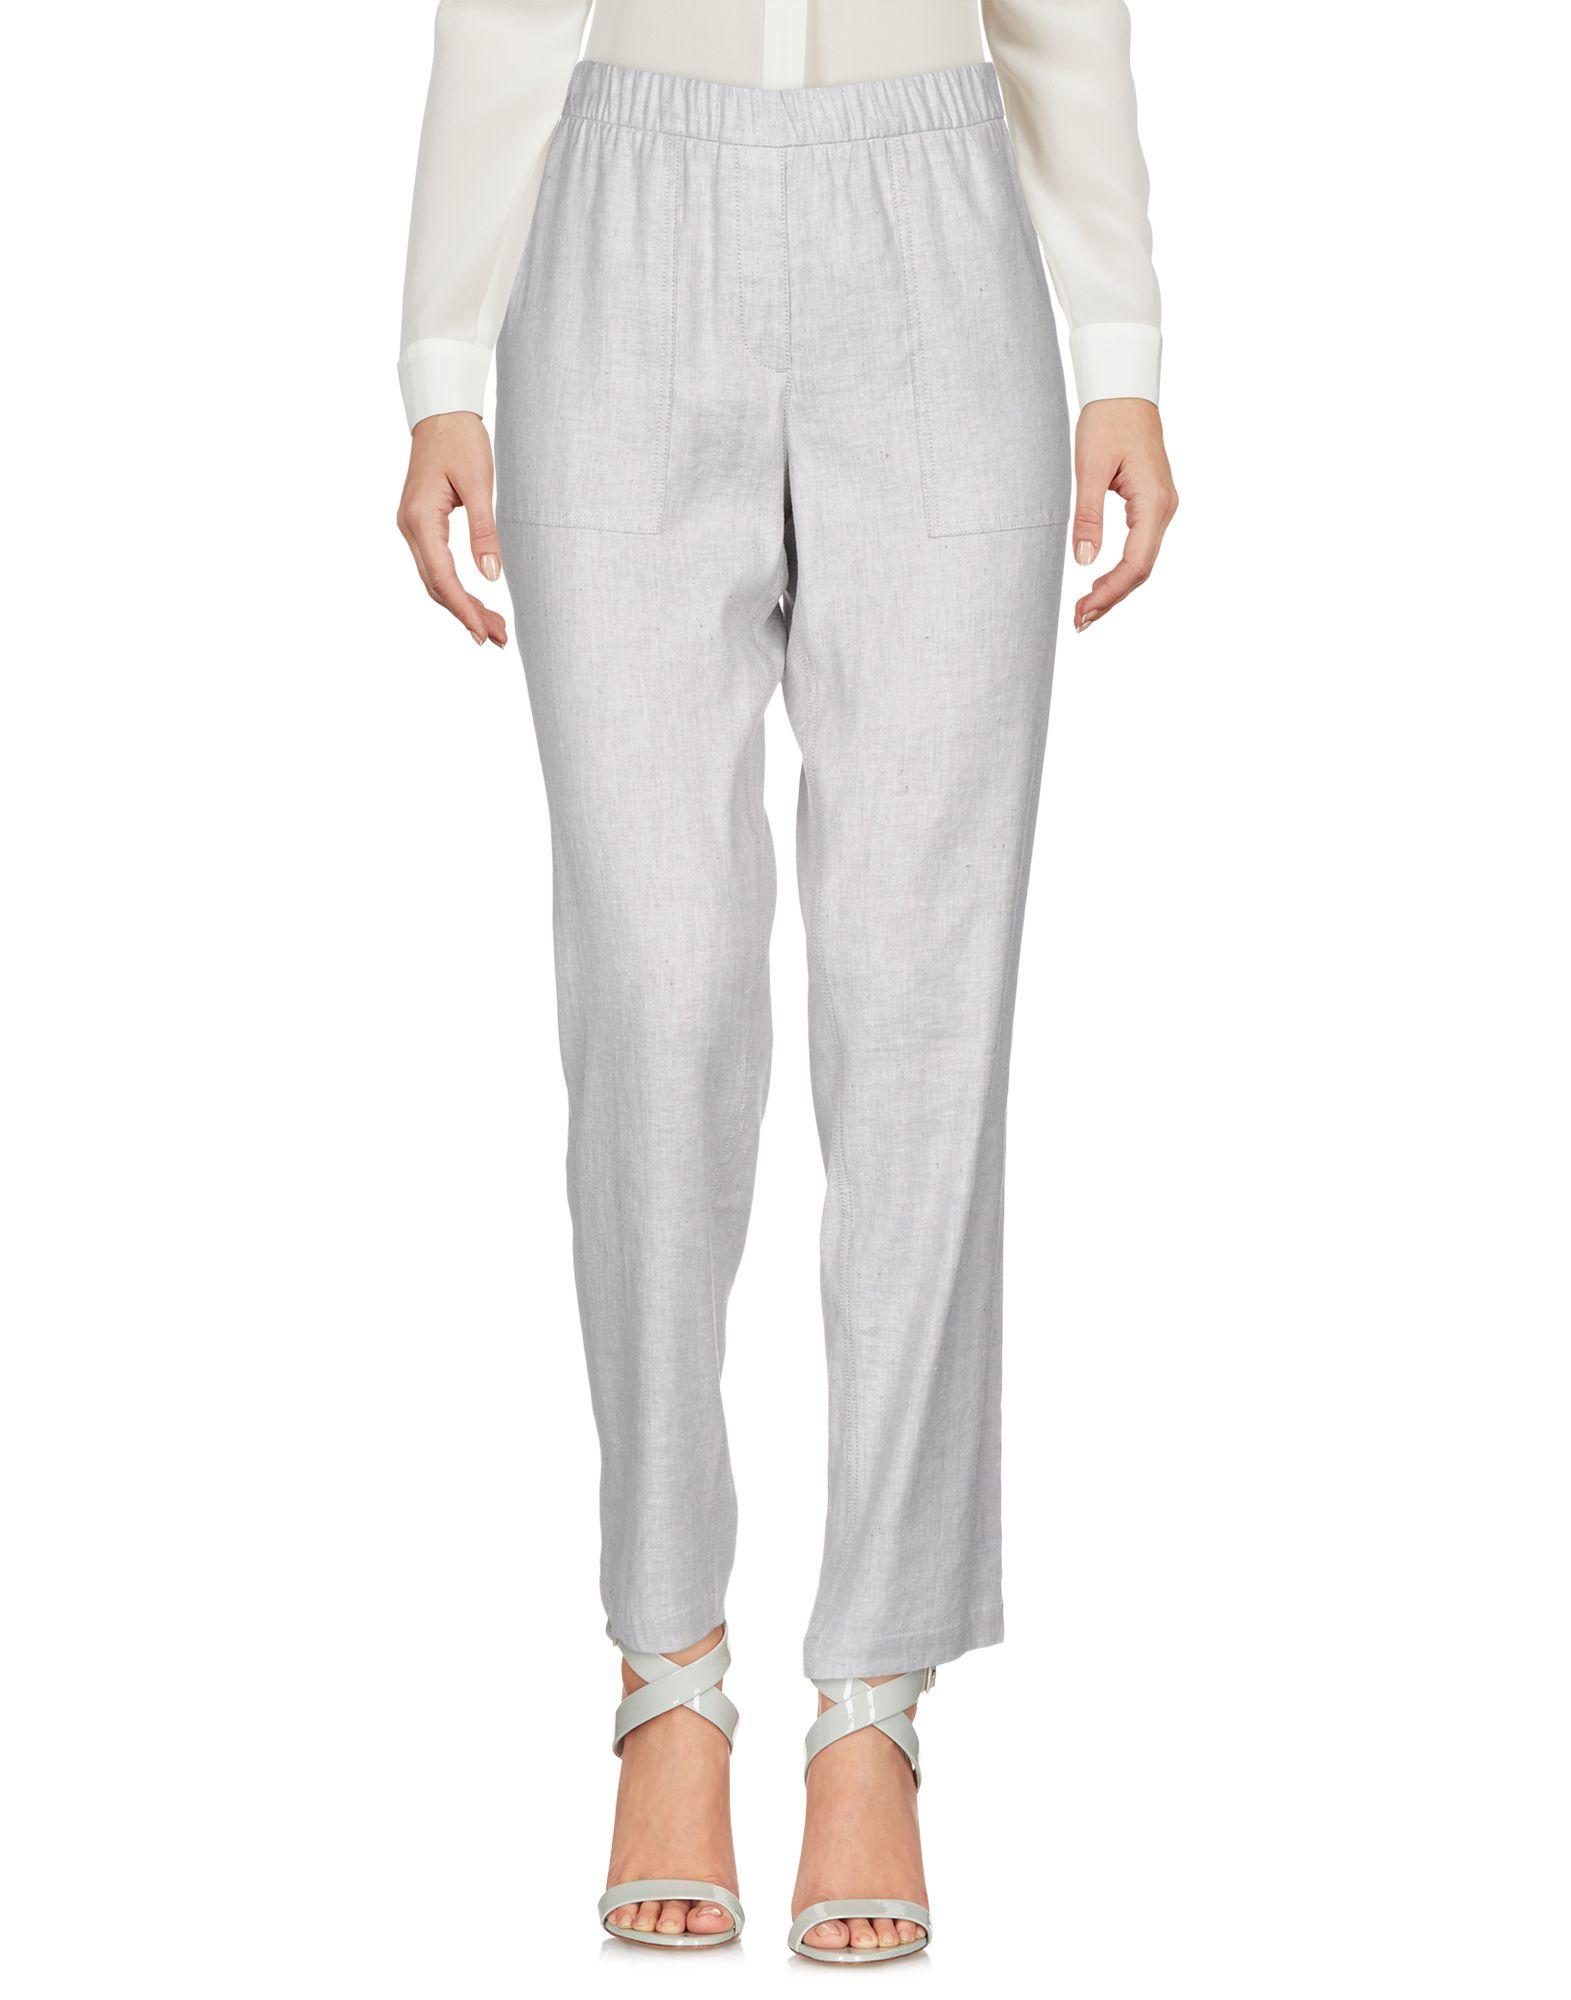 Pantalone Theory Donna - Acquista online su YhnI3hMiVs